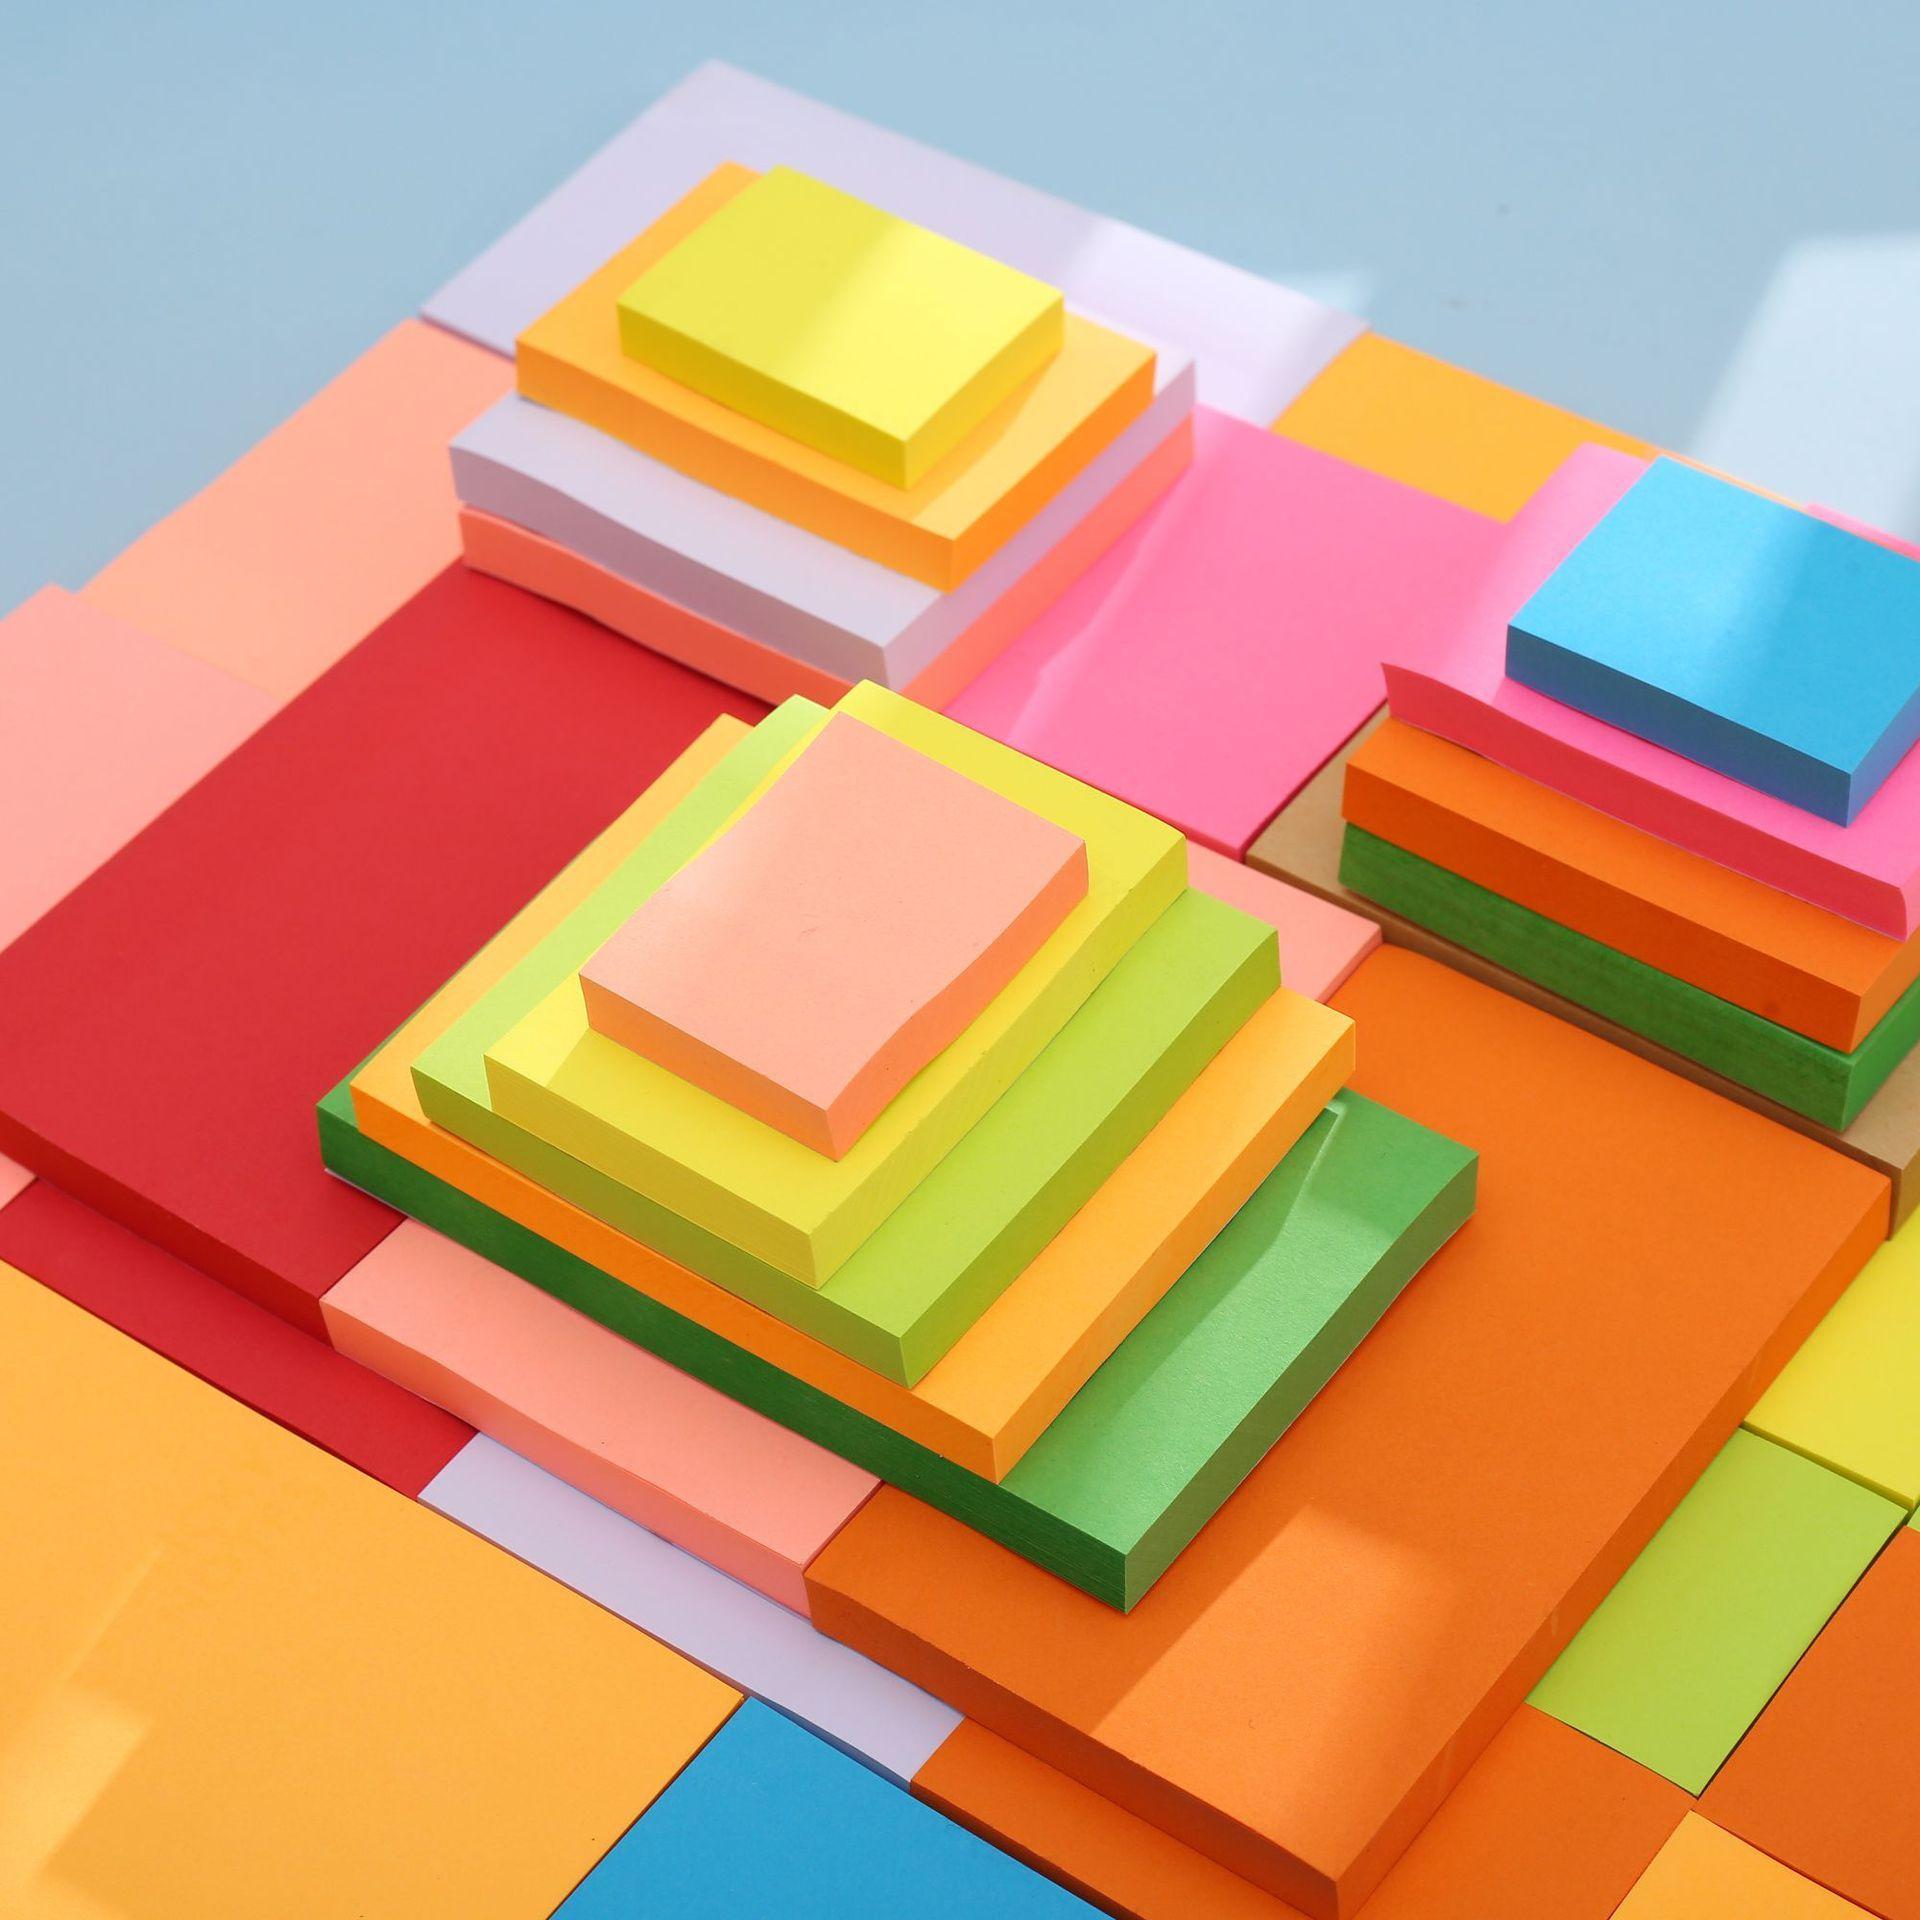 100 Blatt Hinweis Papiers Serie Simple Massivfarbe Kawaii Journal Papier Memo Pad Selbstklebende Schule Büro Schreibwaren Memo PPF23